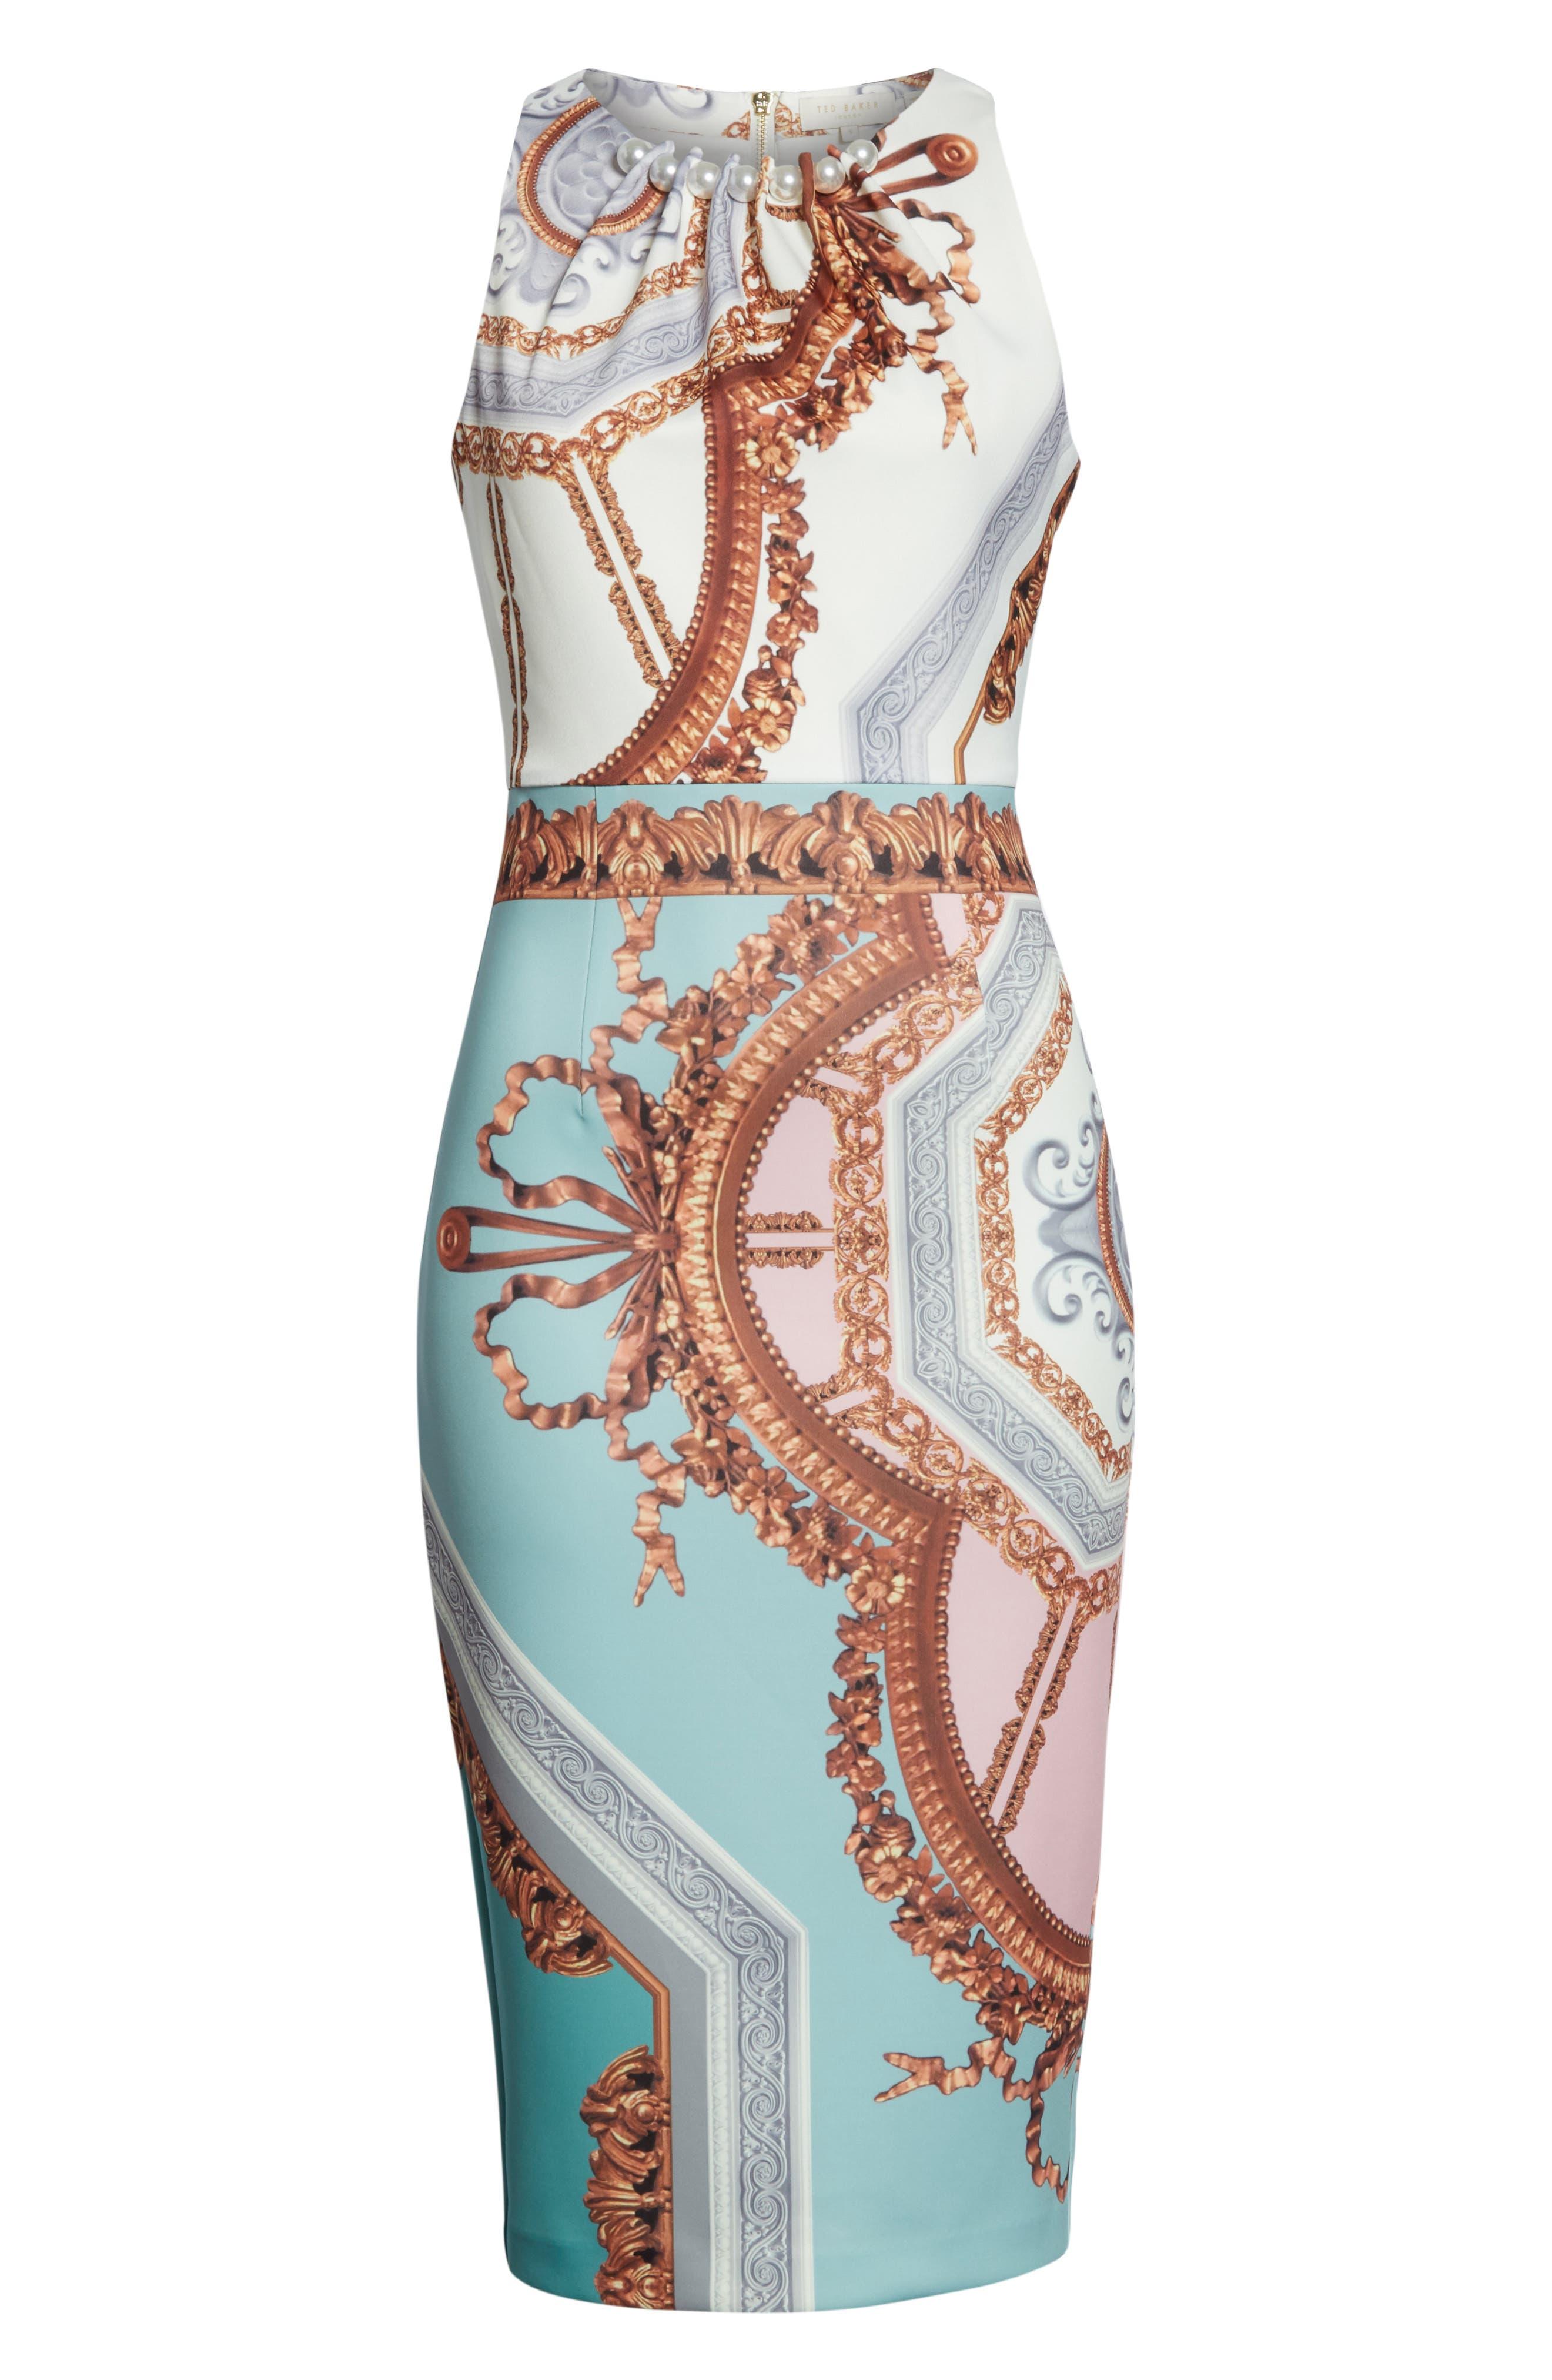 Orlla Embellished Midi Dress,                             Alternate thumbnail 6, color,                             440